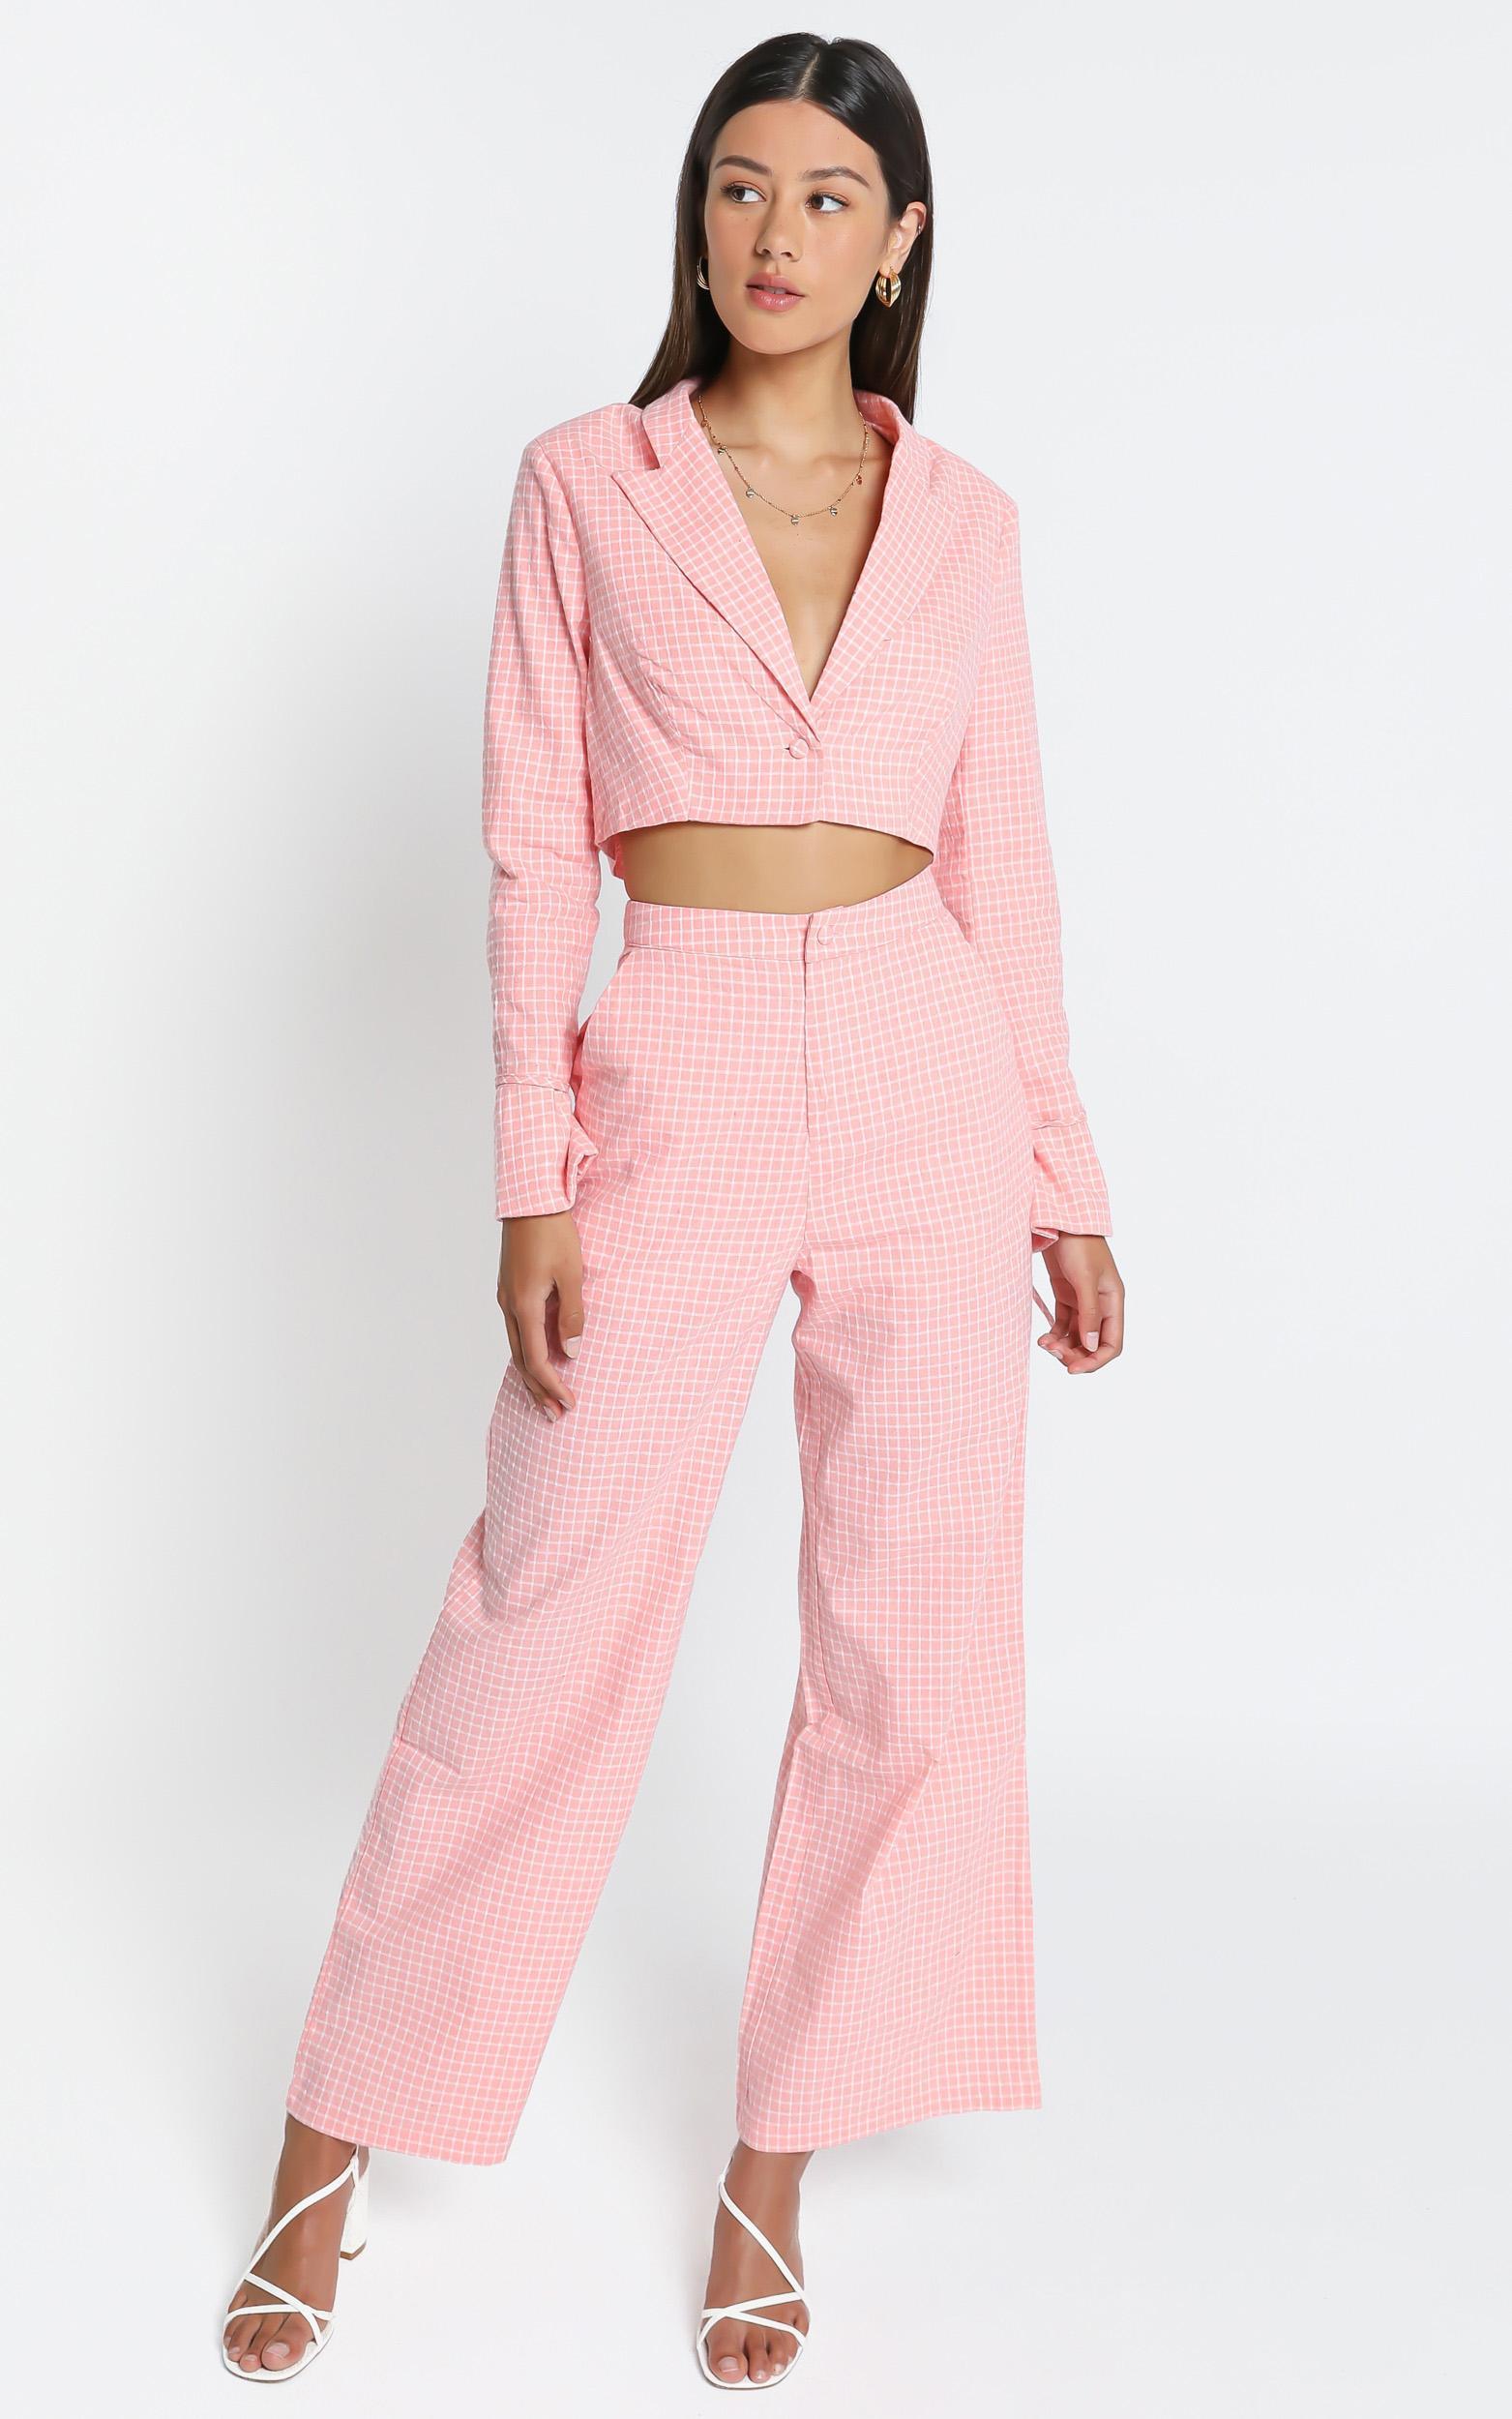 Kalina Pants In Pink Check - 6 (XS), Pink, hi-res image number null